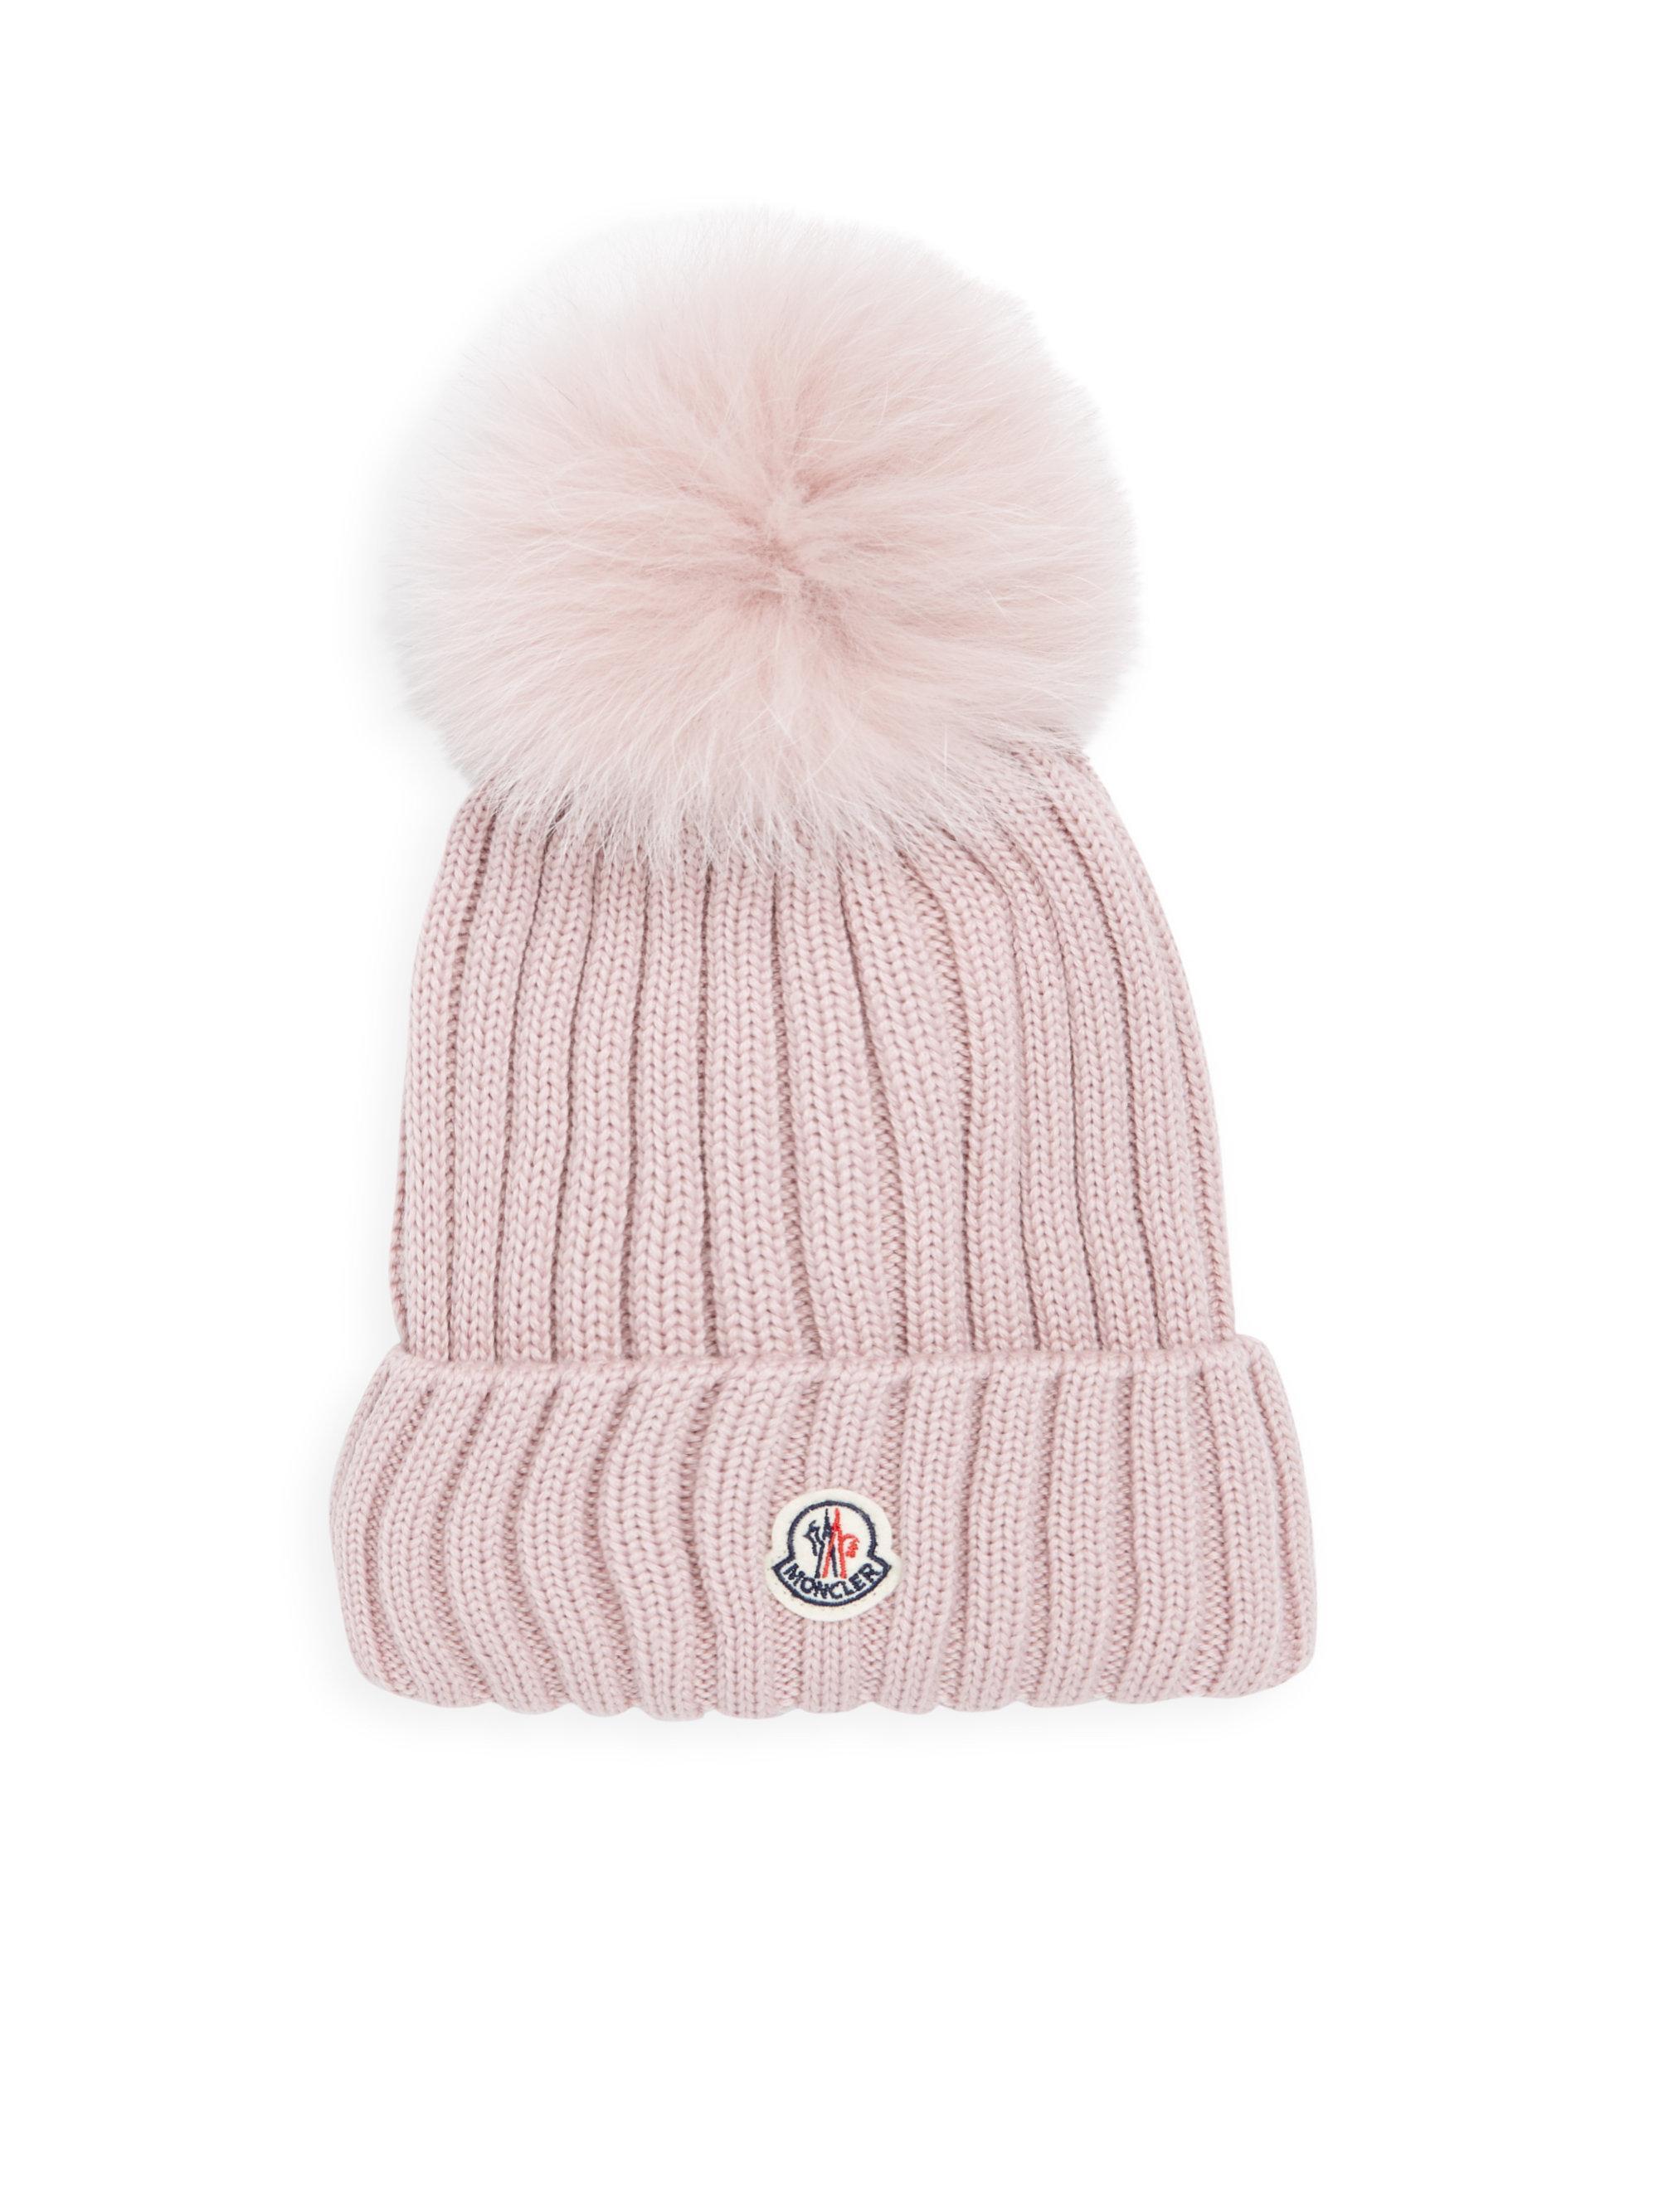 Lyst - Moncler Wool Fur Pom Hat in Pink 56c51f2b2163